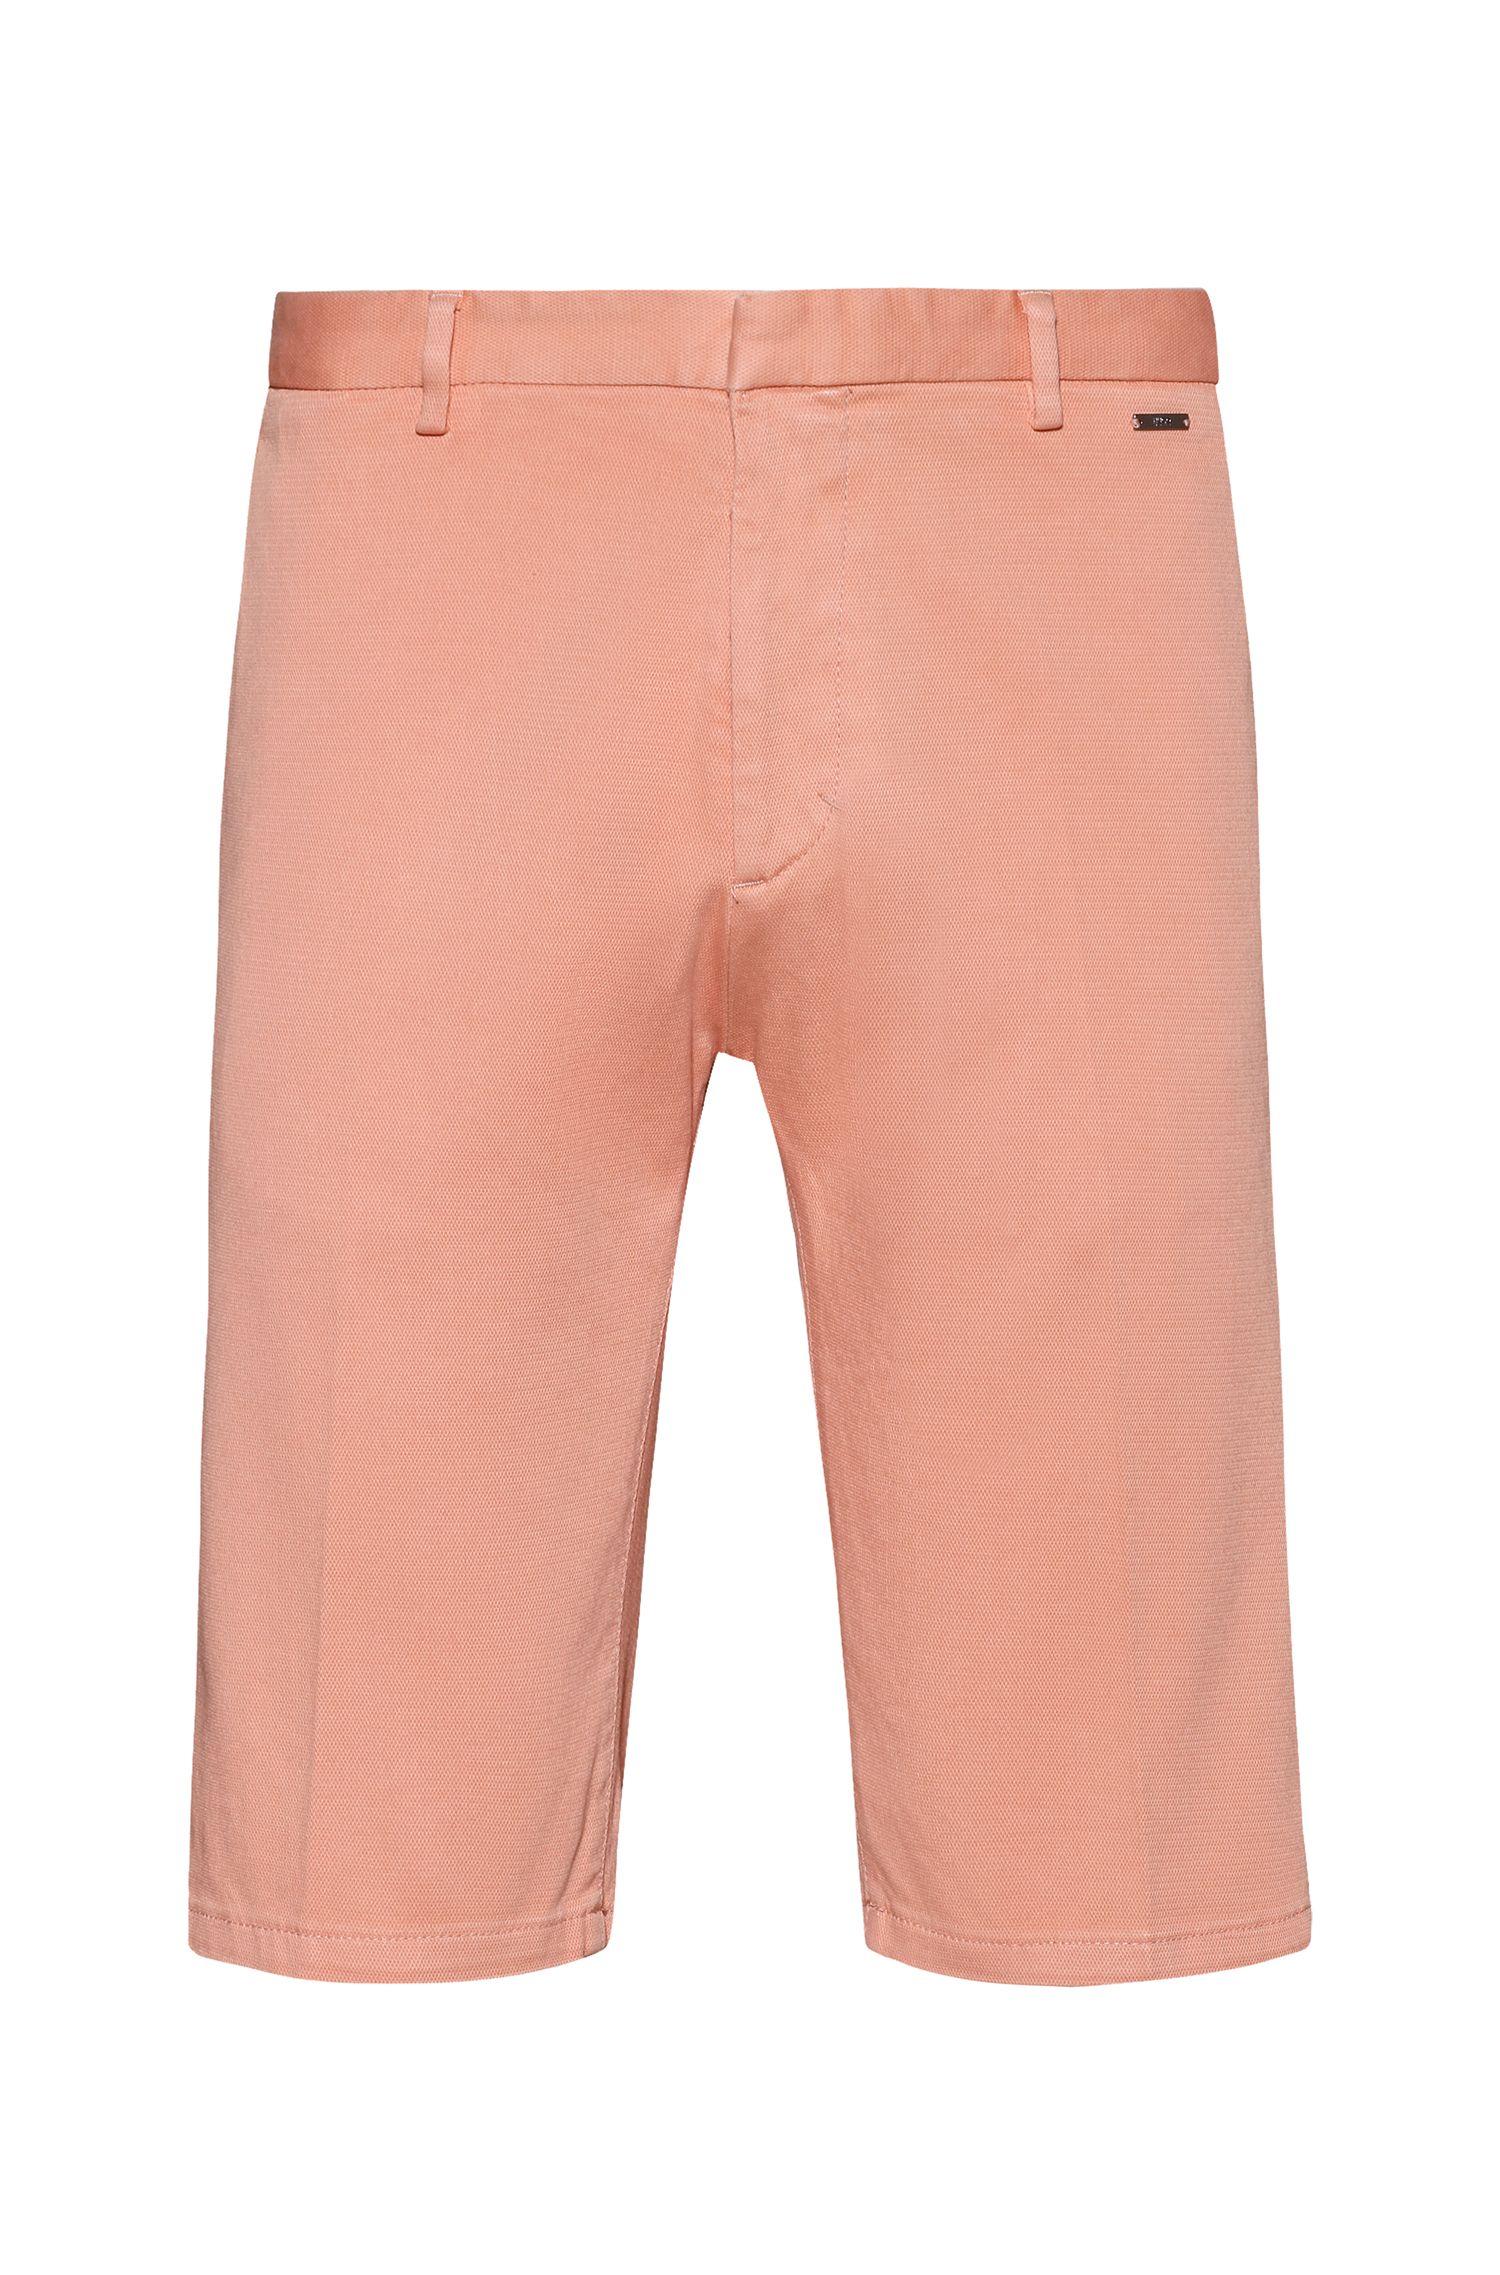 Slim-leg shorts in overdyed stretch cotton, Light Orange